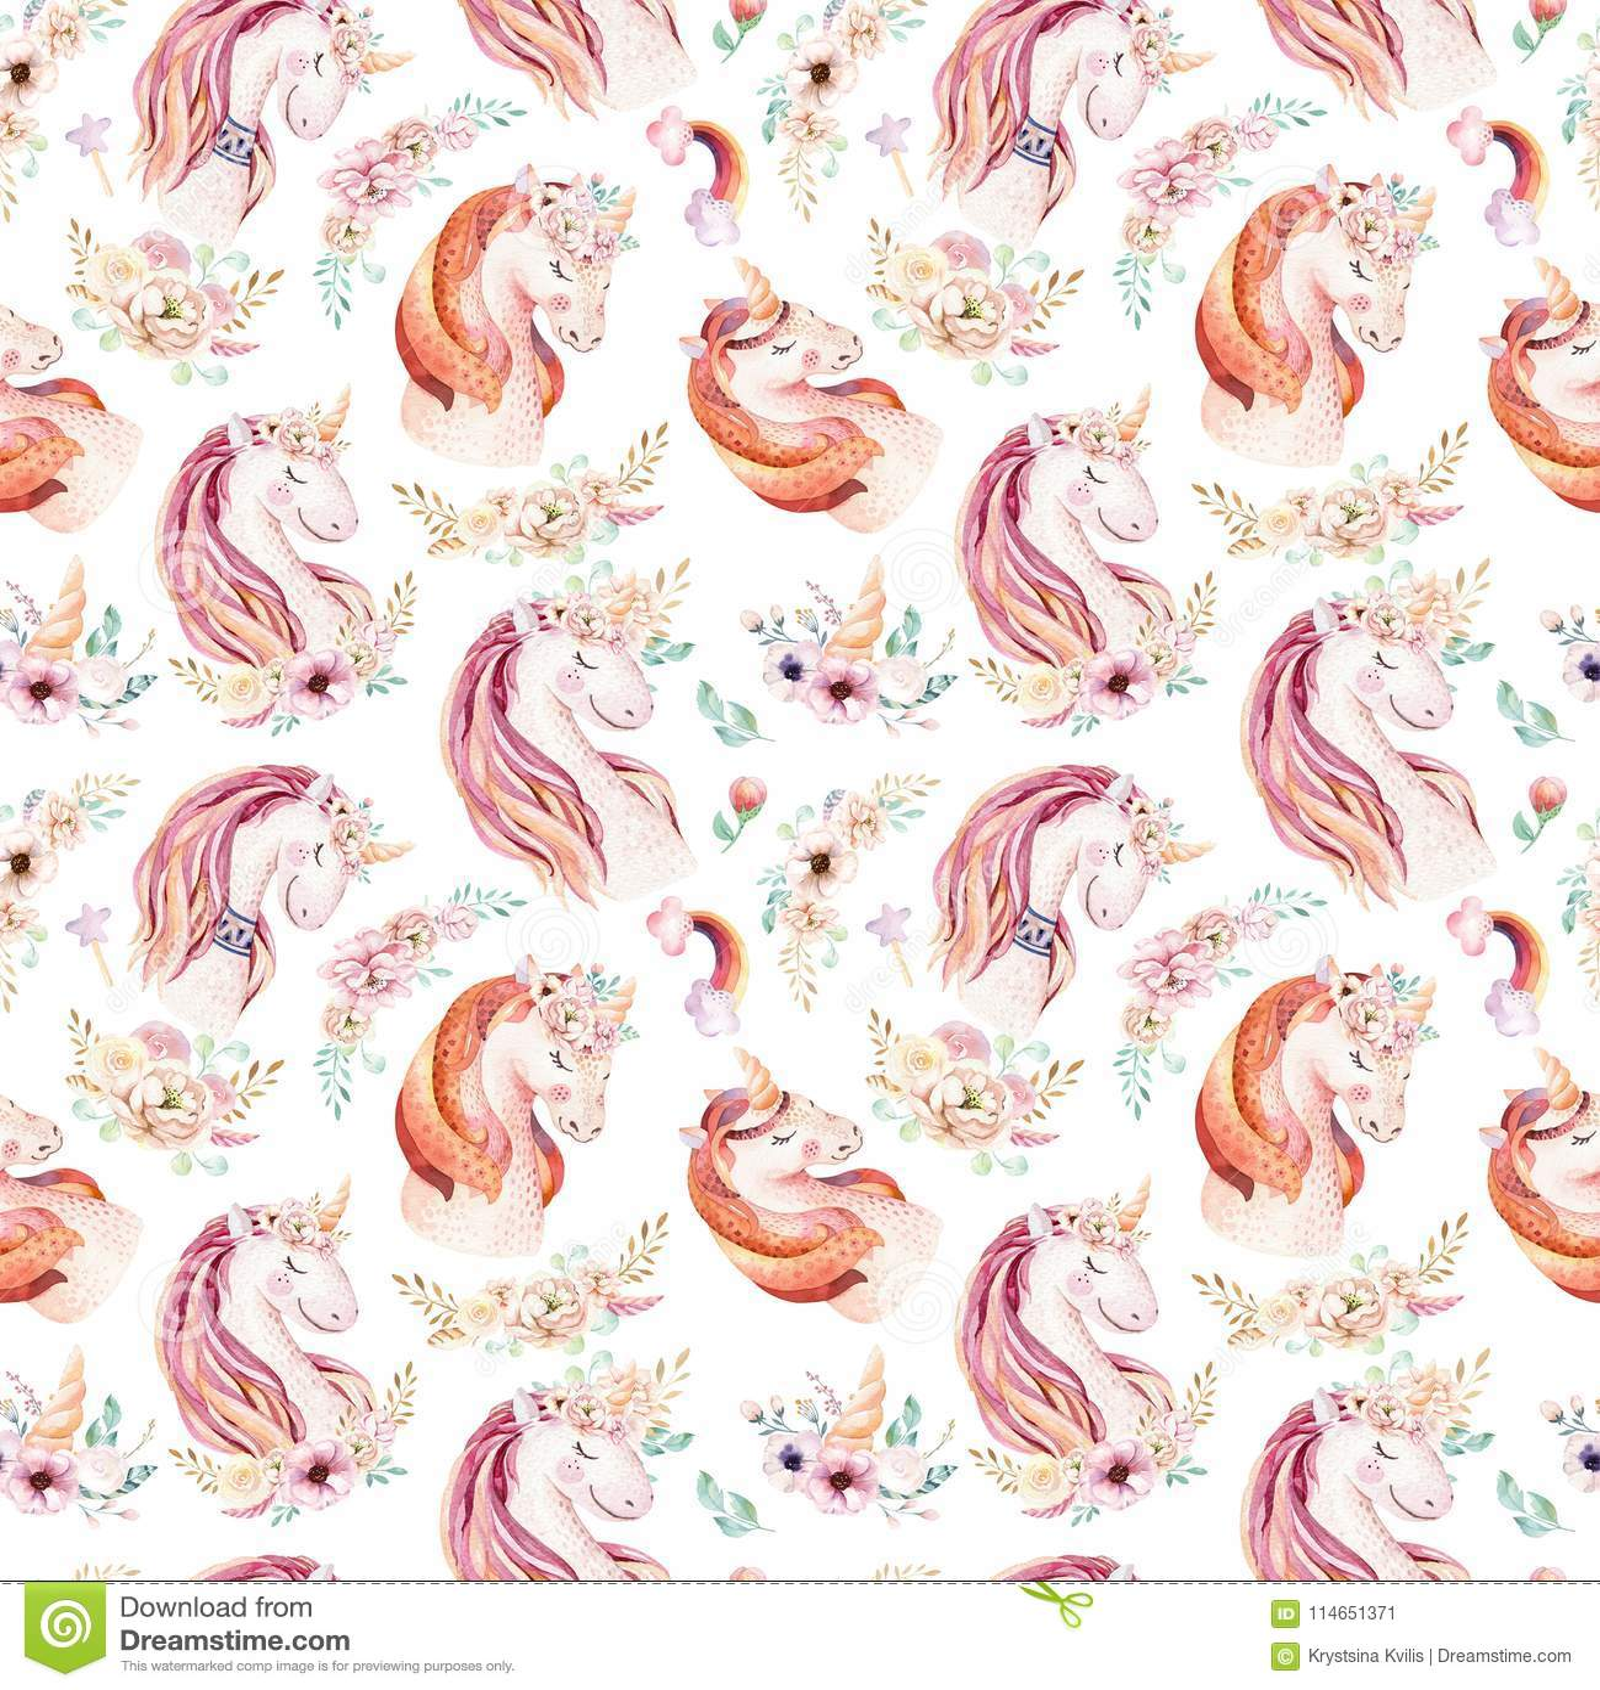 Cute watercolor unicorn seamless pattern with flowers. Nursery magic unicorn patterns. Princess rainbow texture. Trendy